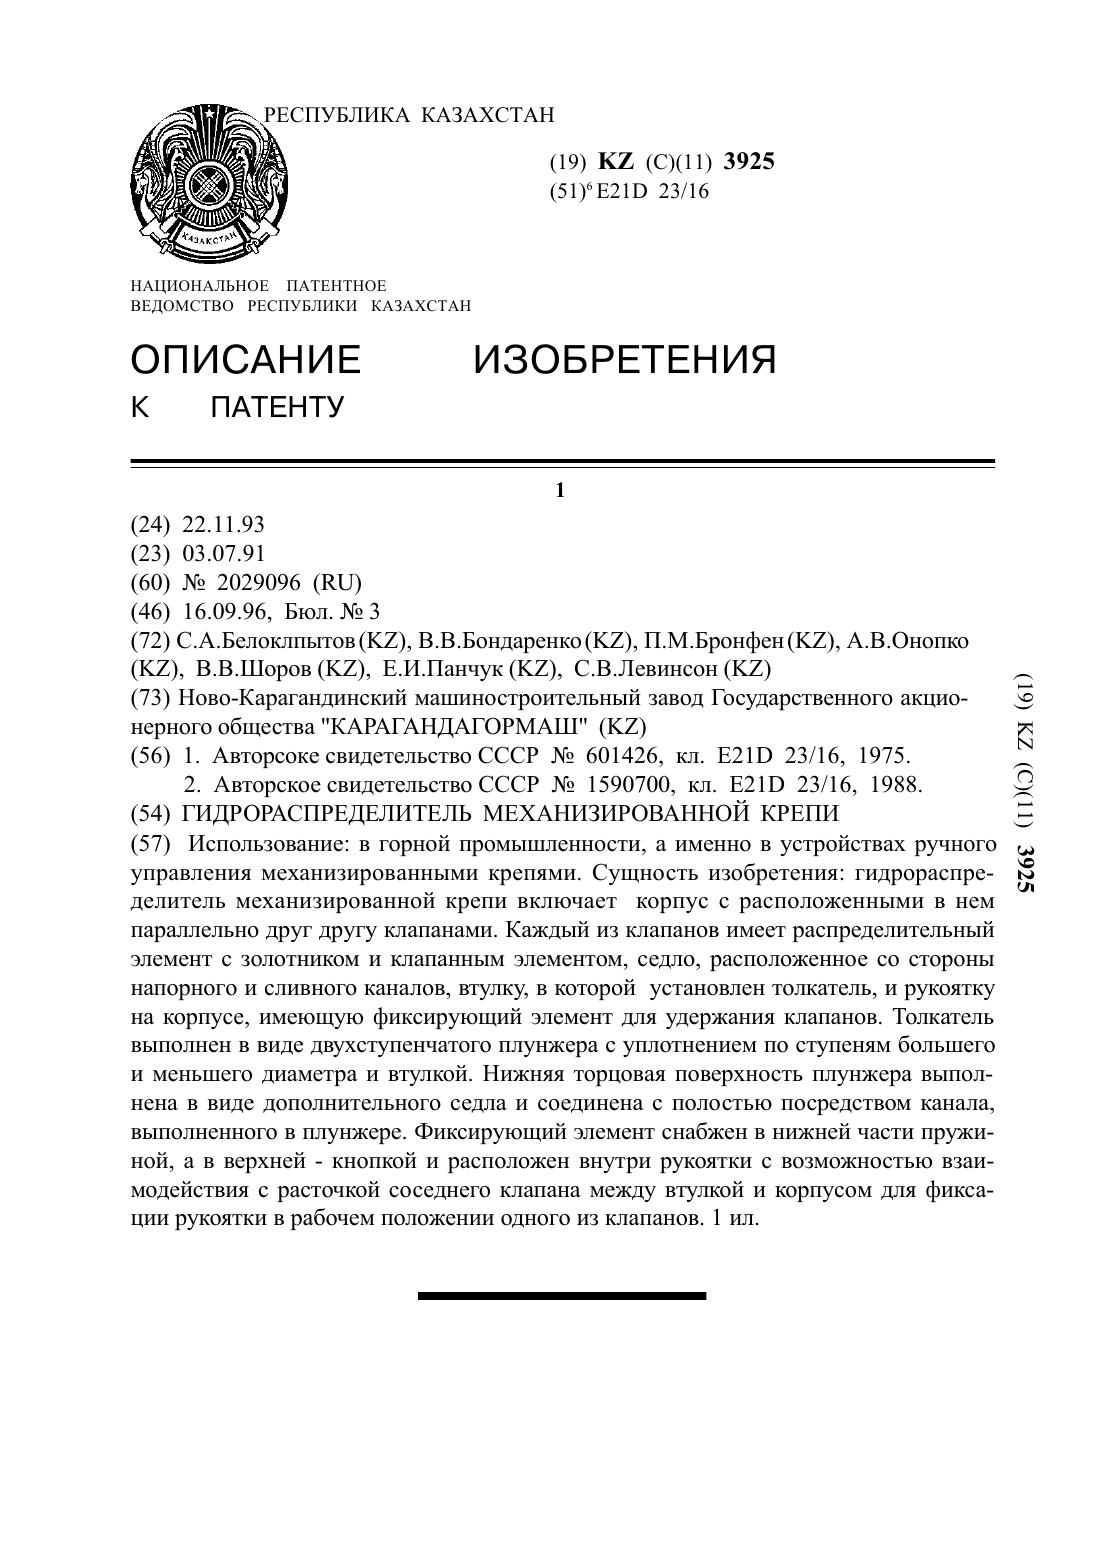 панчук игорь петрович химки биография